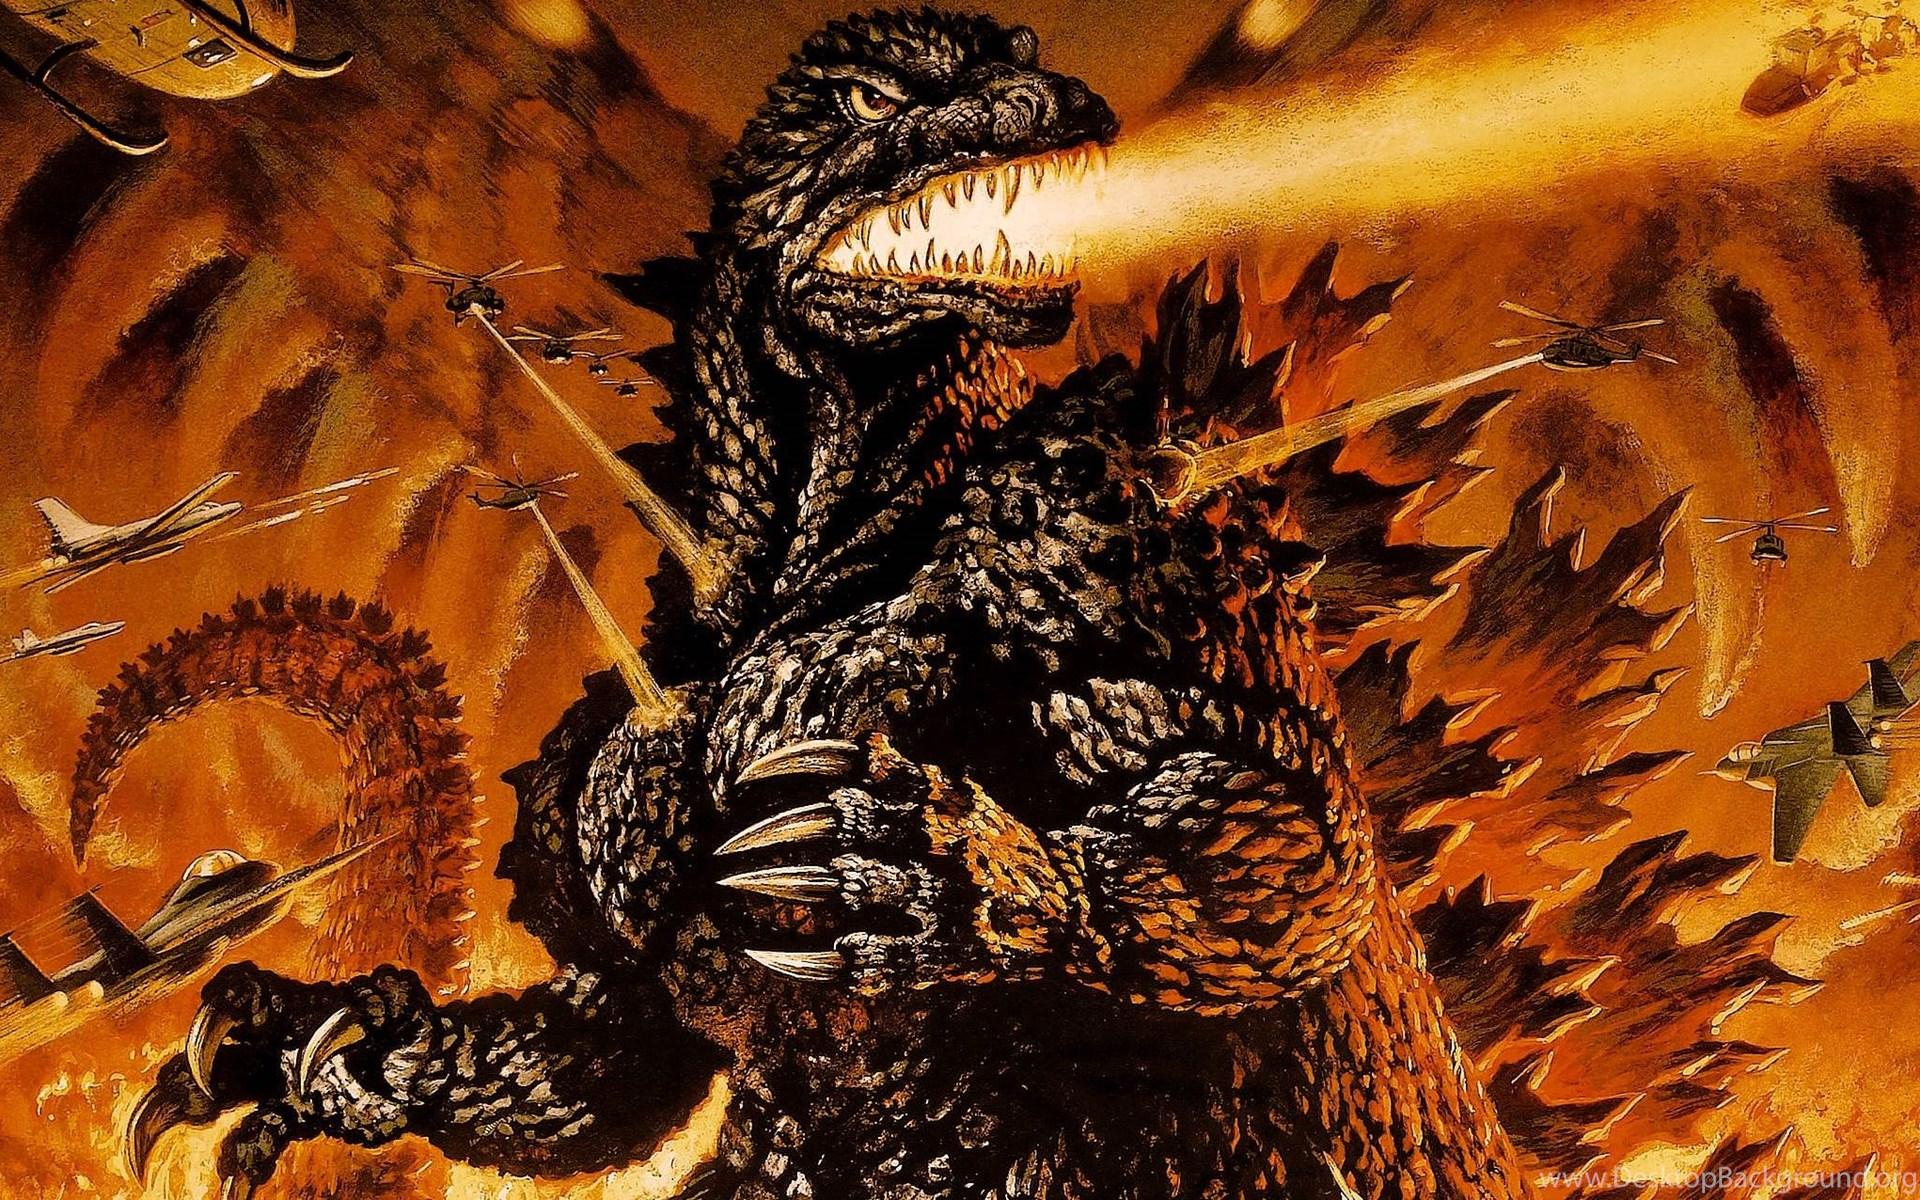 The Gallery For Godzilla Vs King Ghidorah Wallpapers Desktop